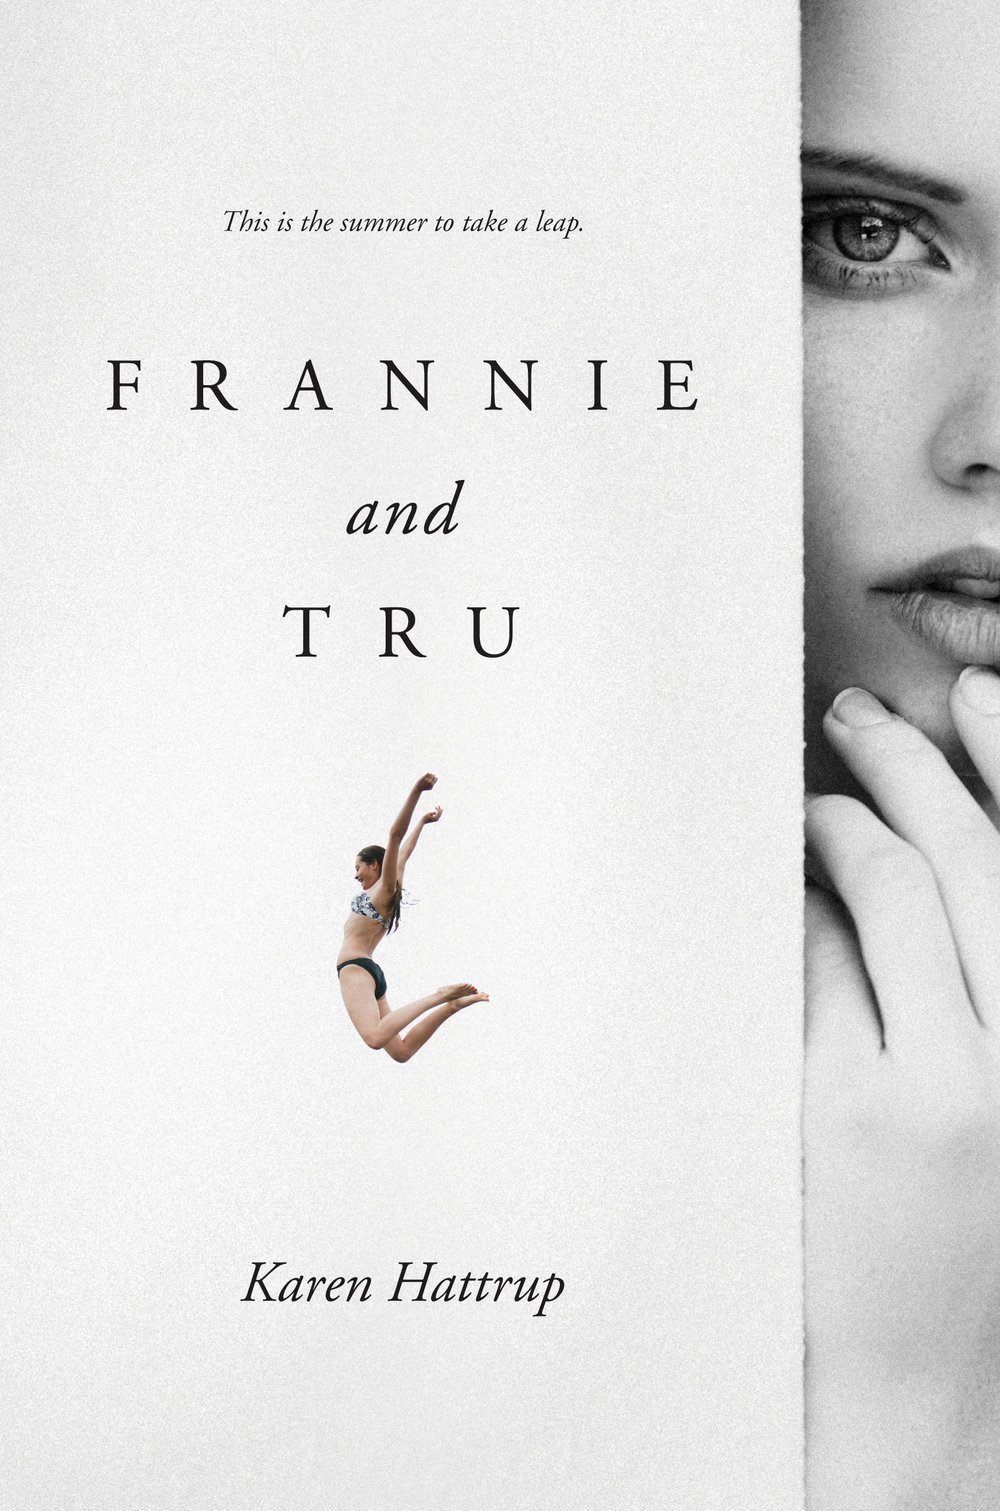 Frannie and Tru.jpg